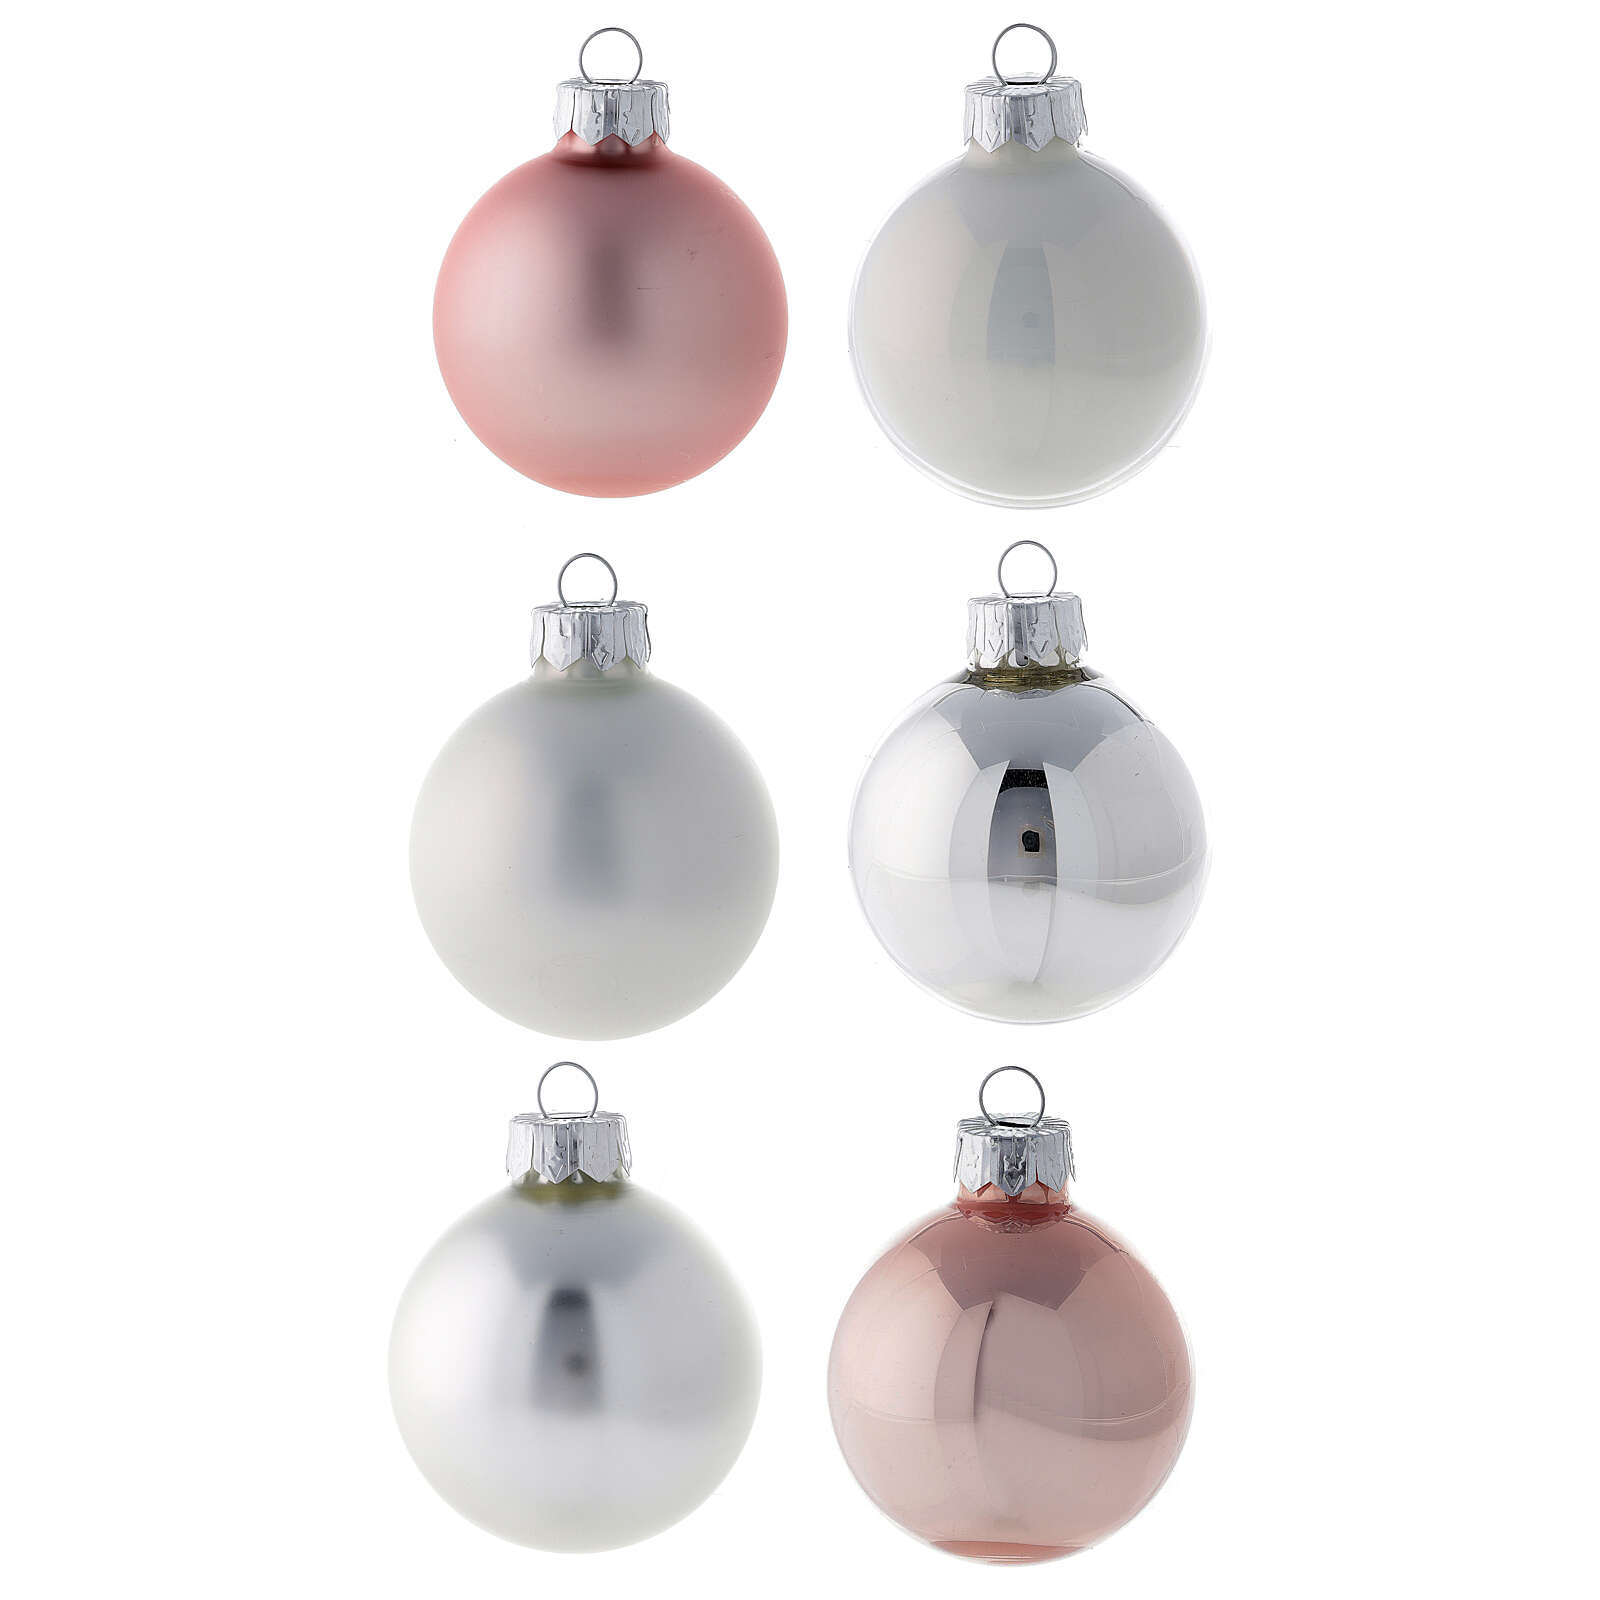 Set puntale 16 palle 50 mm albero Natale vetro soffiato bianco rosa argento 4